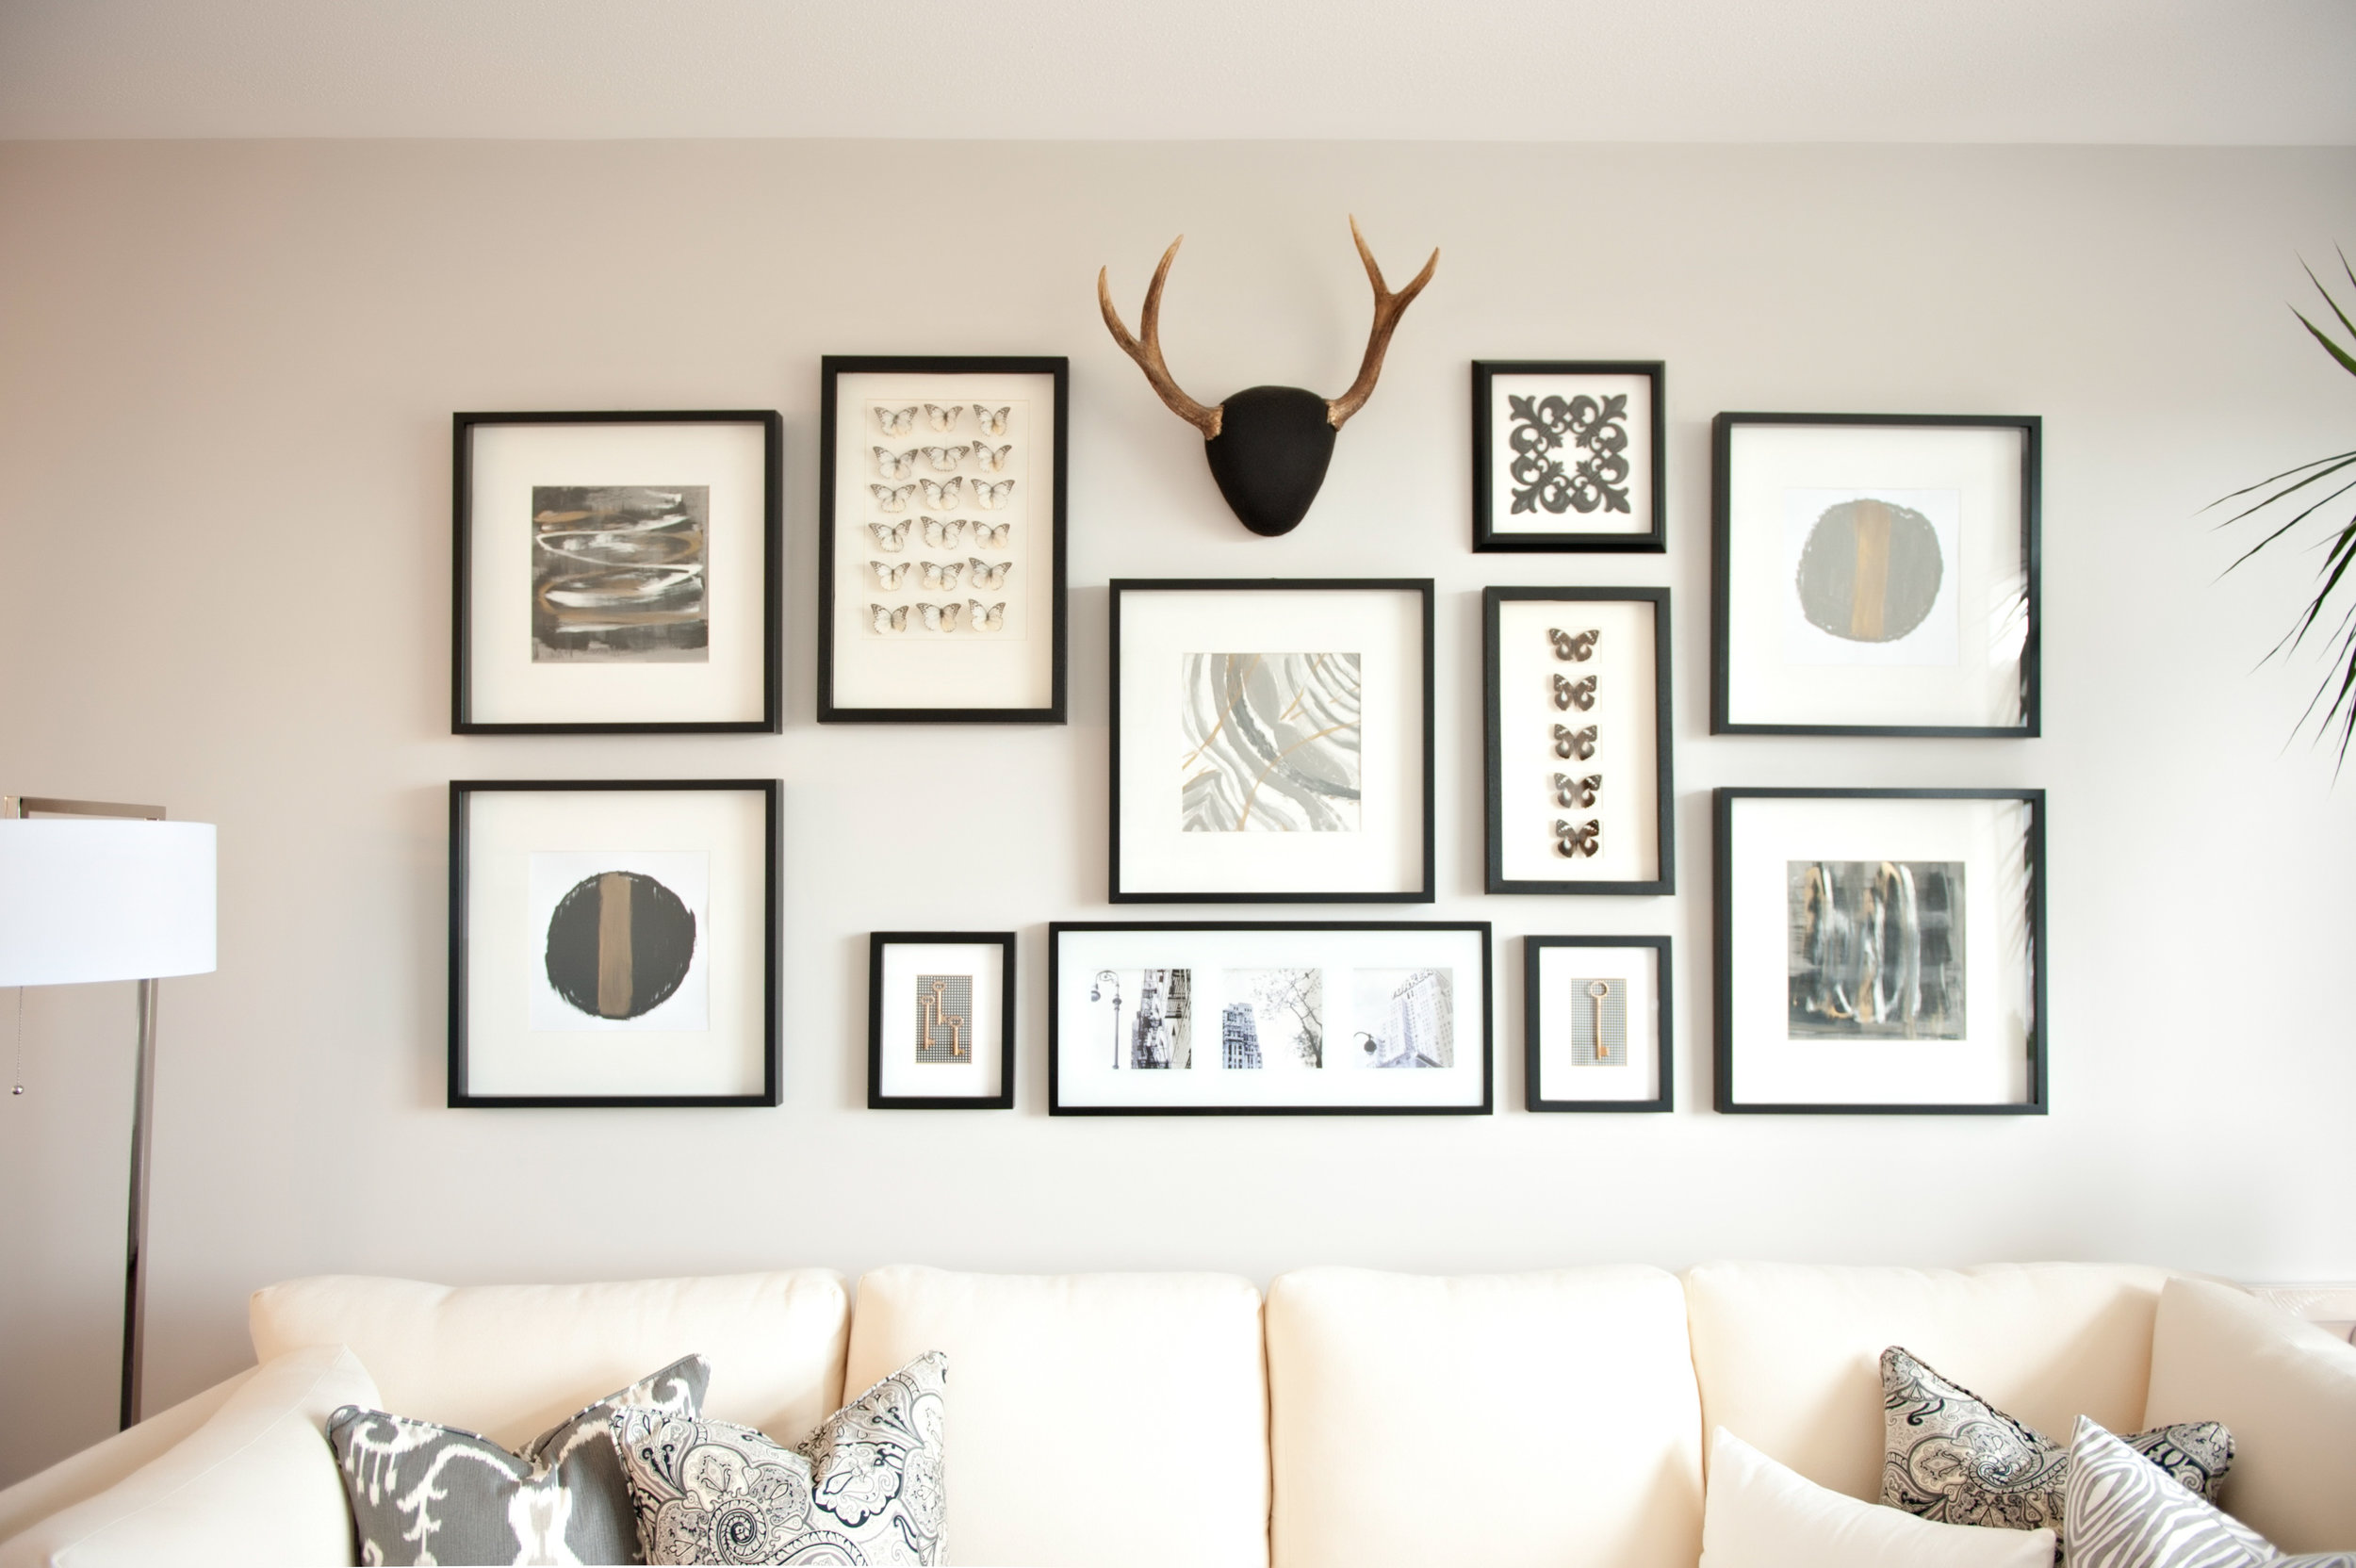 Interior-Design-Feature-Wall-Artwork-Antlers